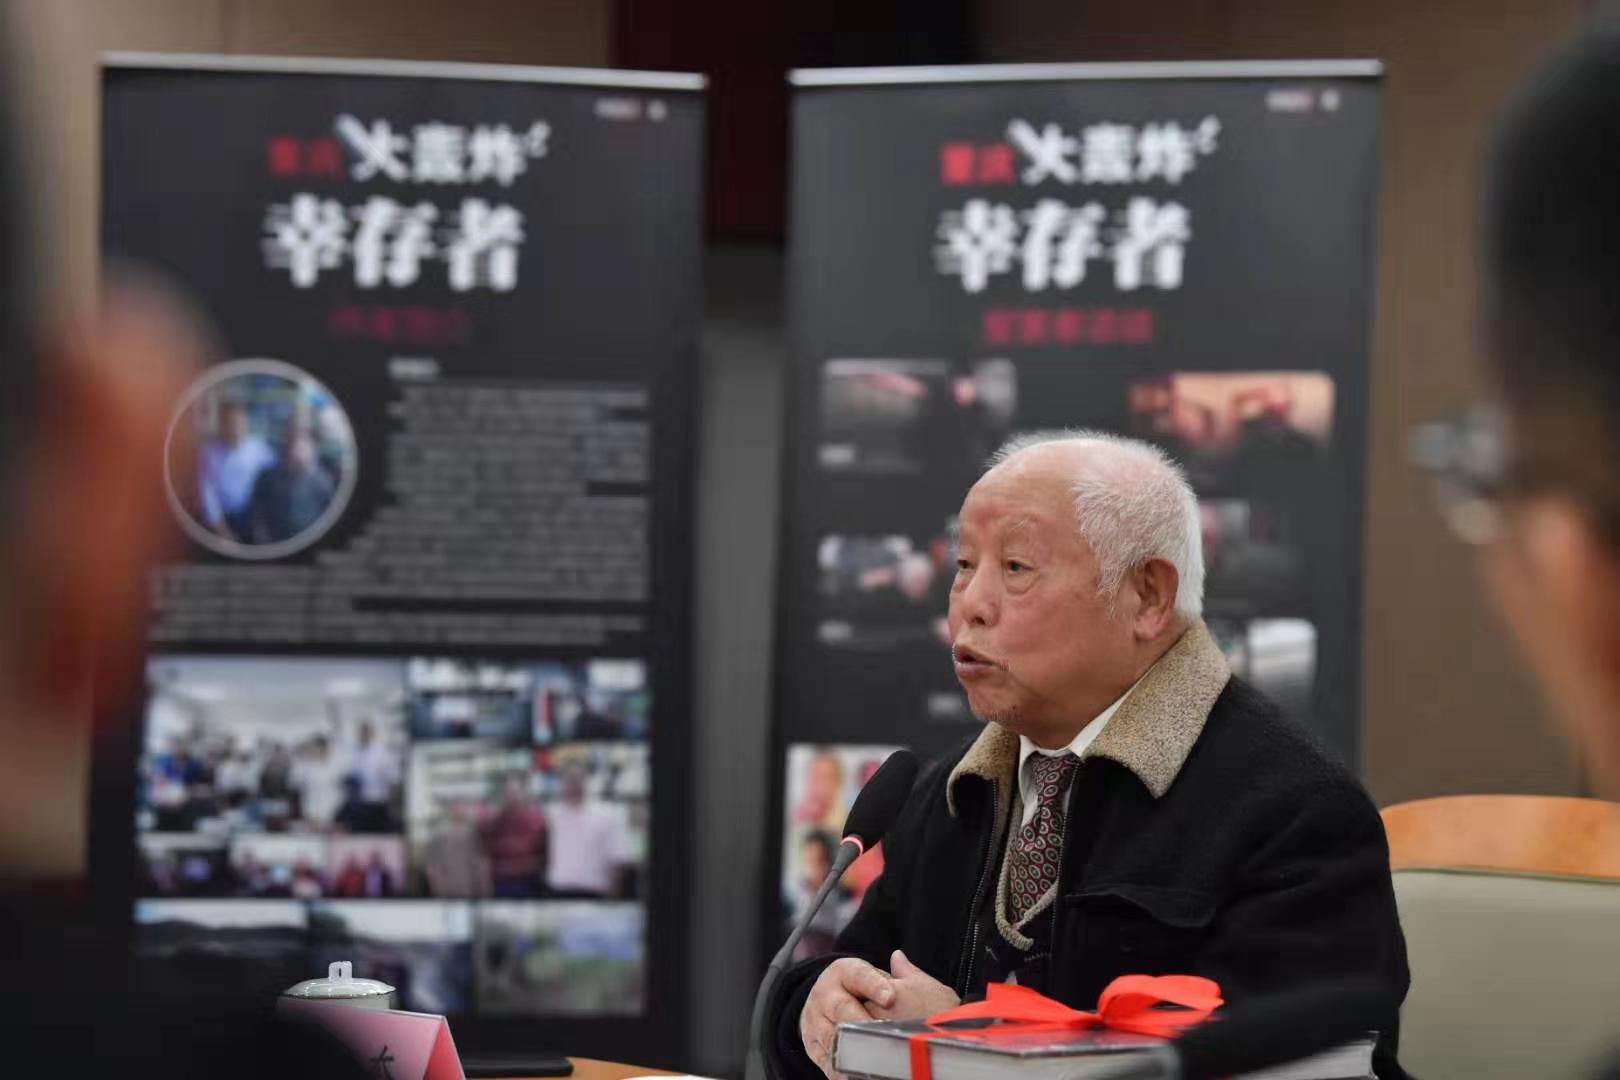 http://jszhy.cn/jingshan/163174.html